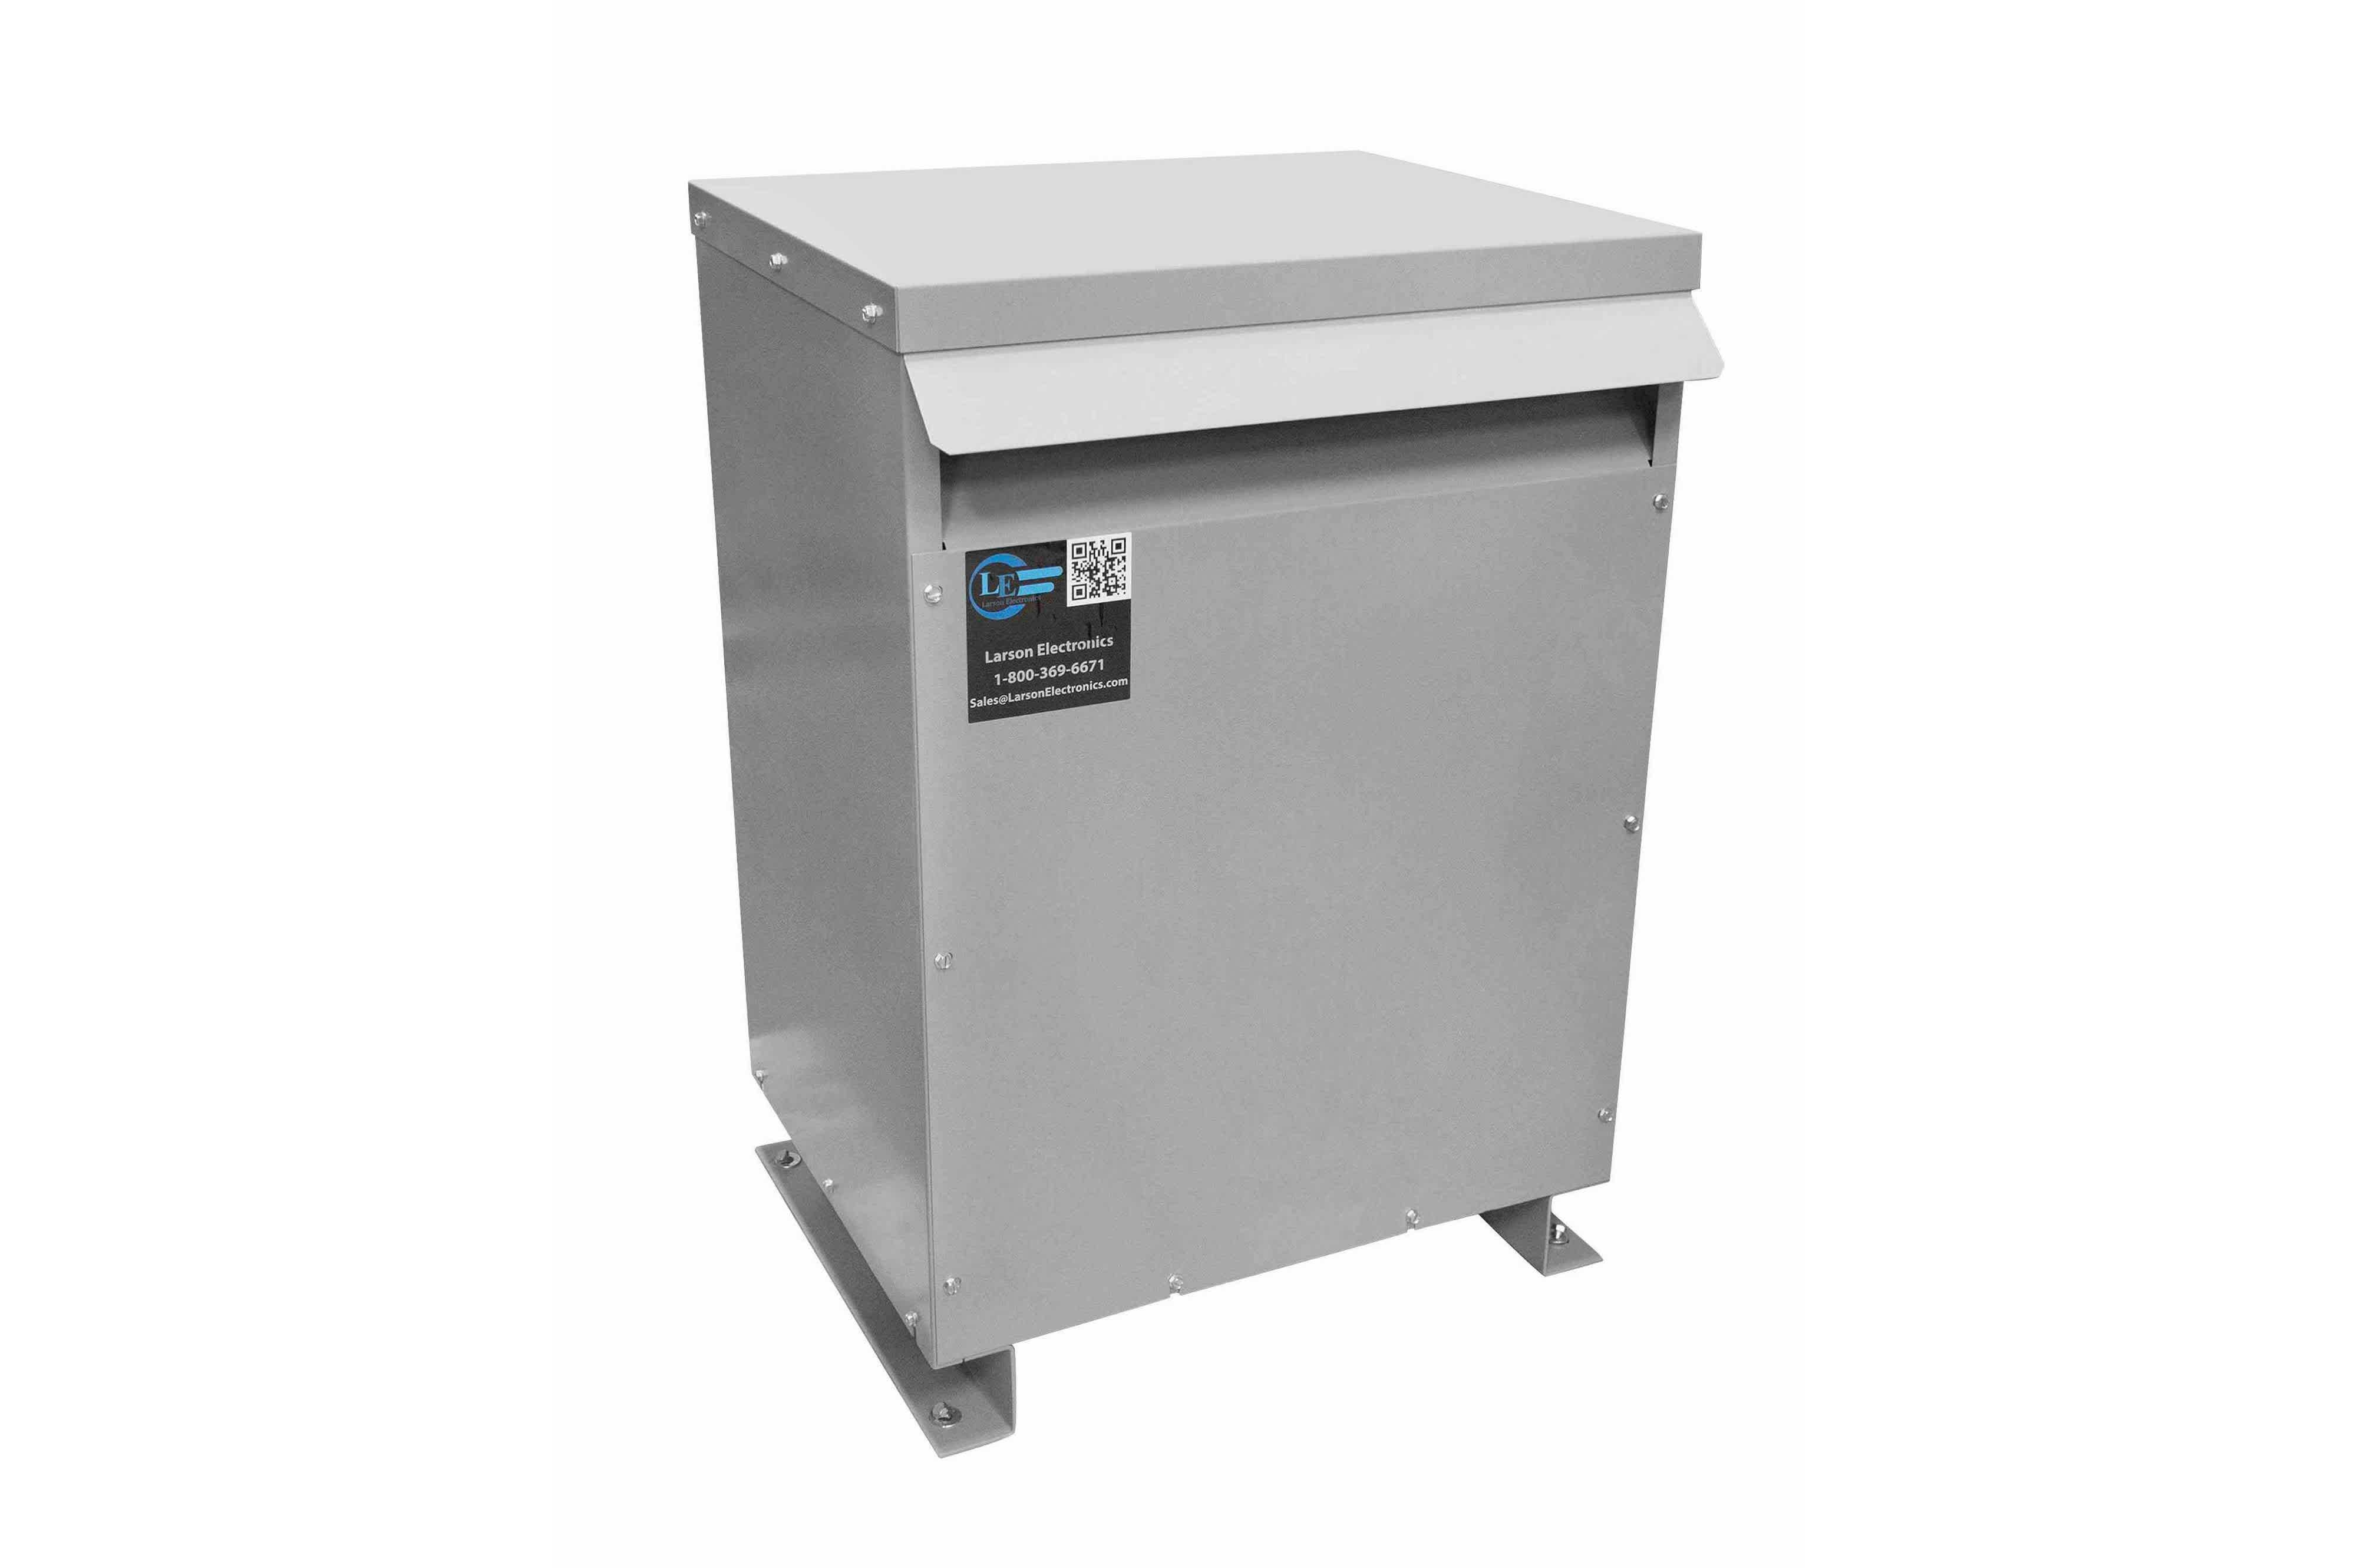 55 kVA 3PH Isolation Transformer, 480V Wye Primary, 600V Delta Secondary, N3R, Ventilated, 60 Hz